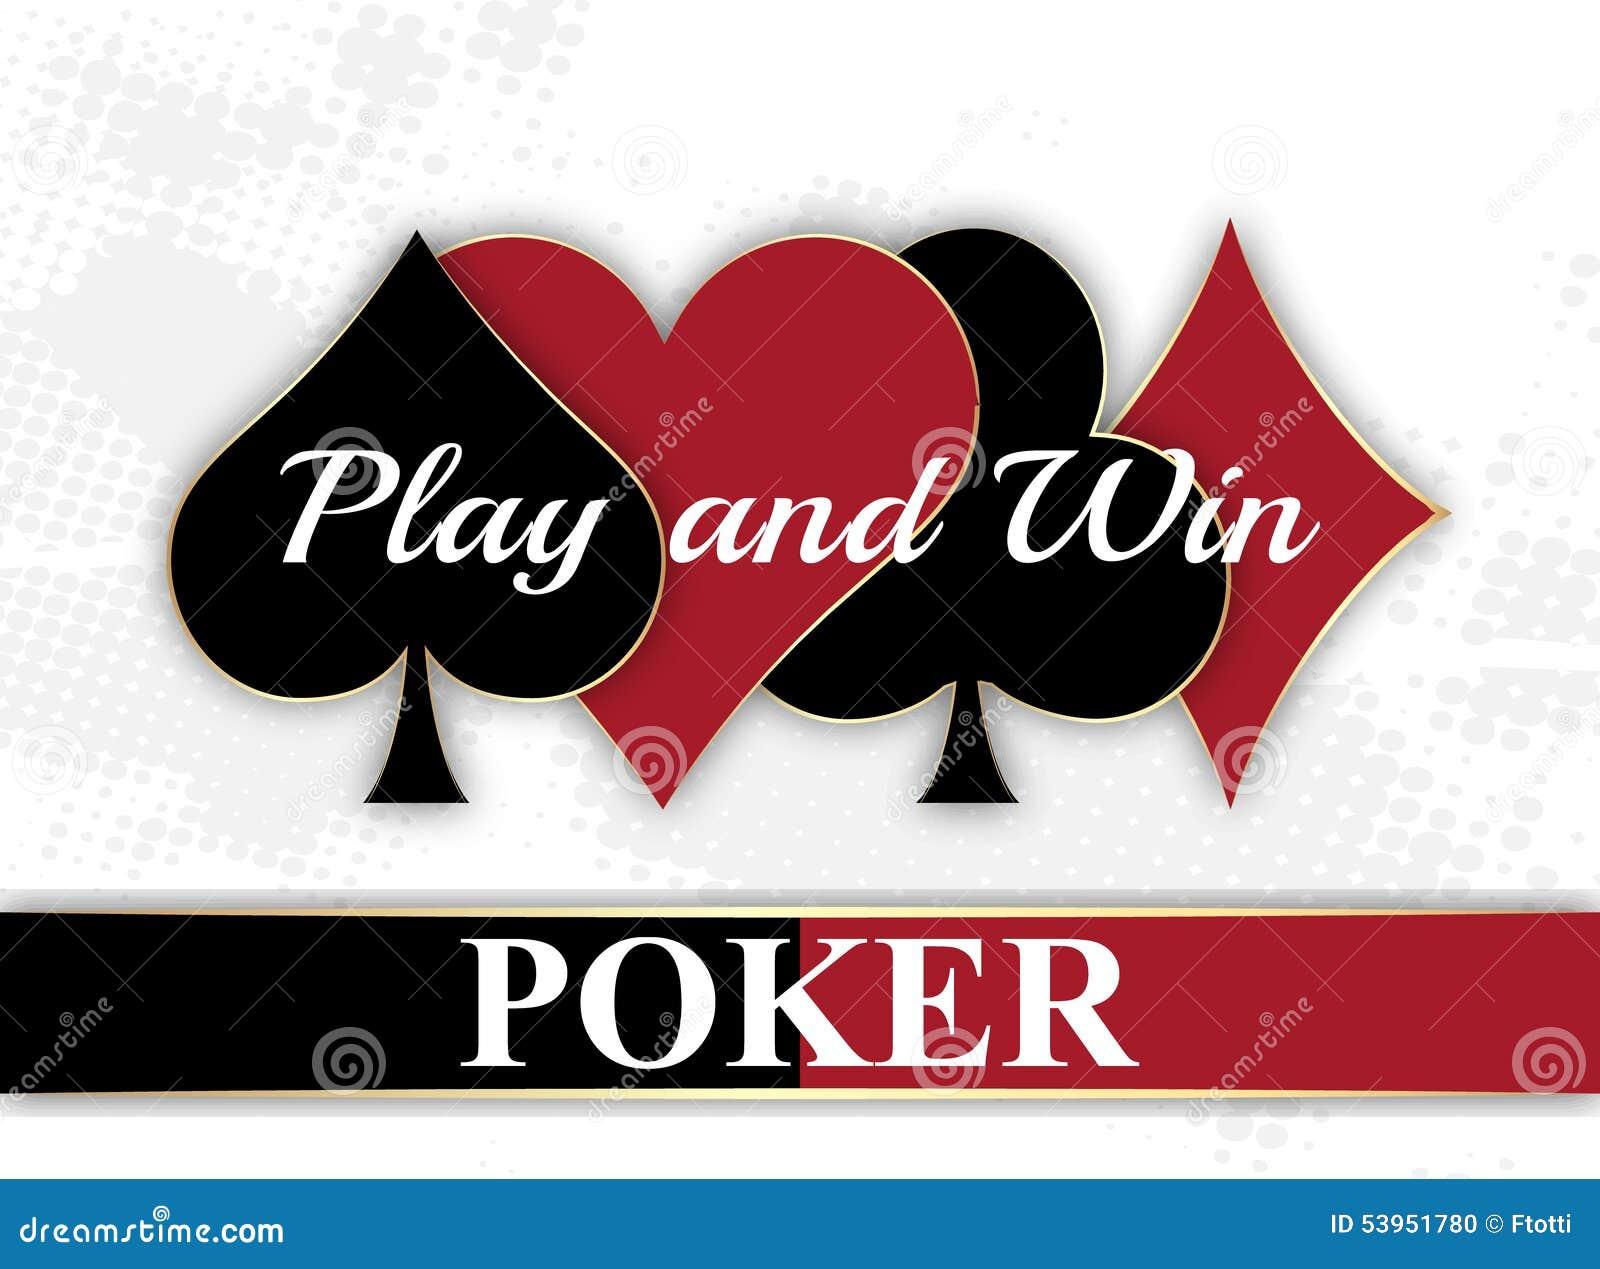 Poker wallpaper with playing card symbols stock vector poker wallpaper with playing card symbols biocorpaavc